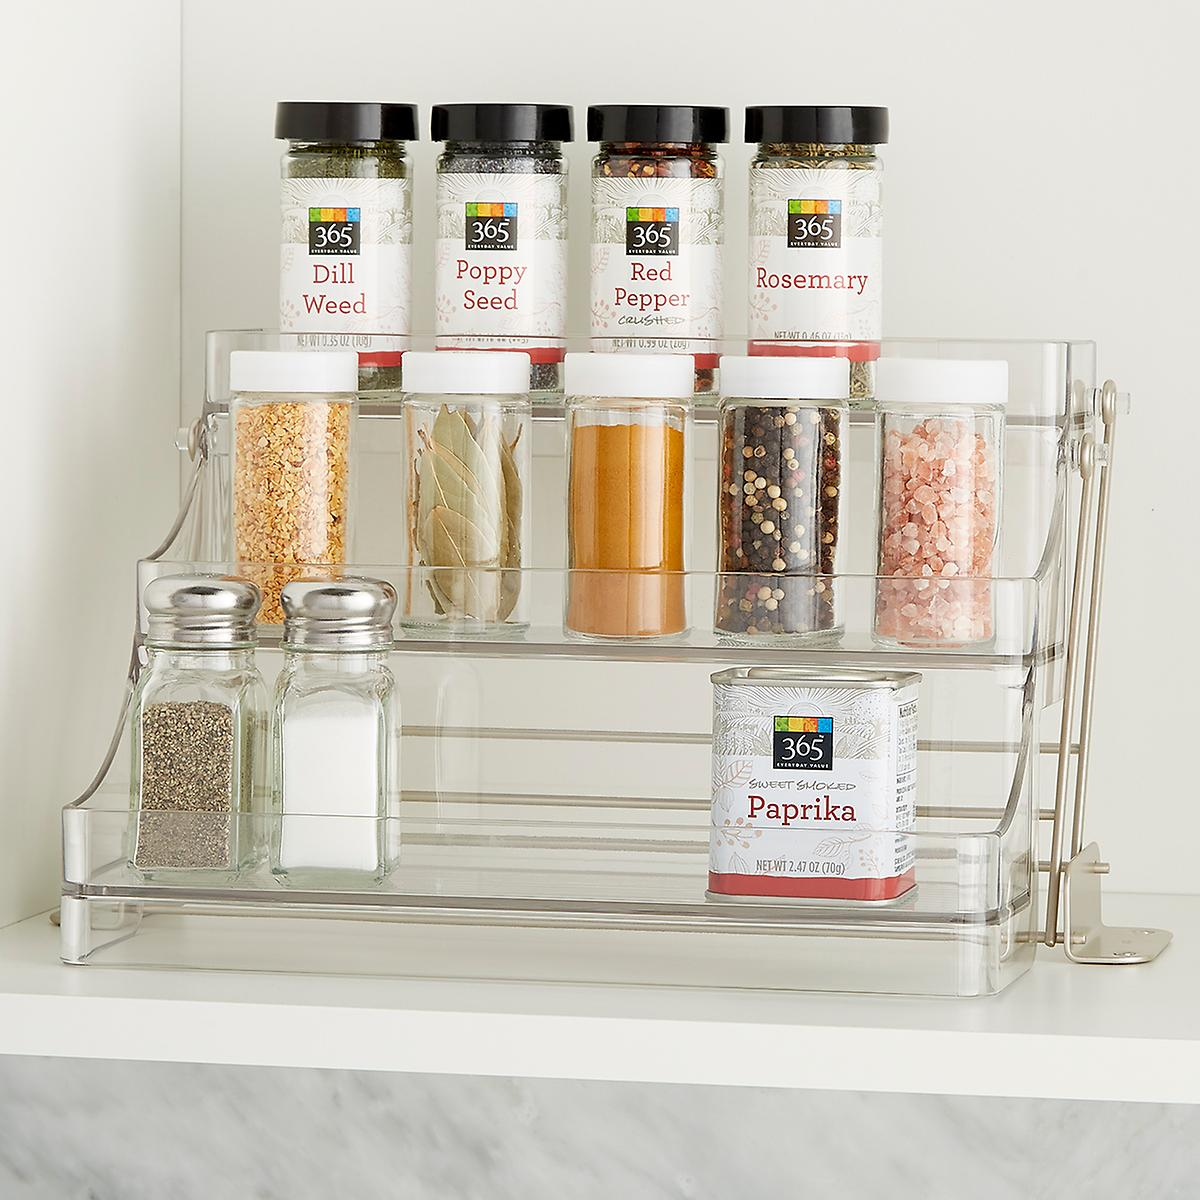 InterDesign Linus Easy-Reach Spice Rack